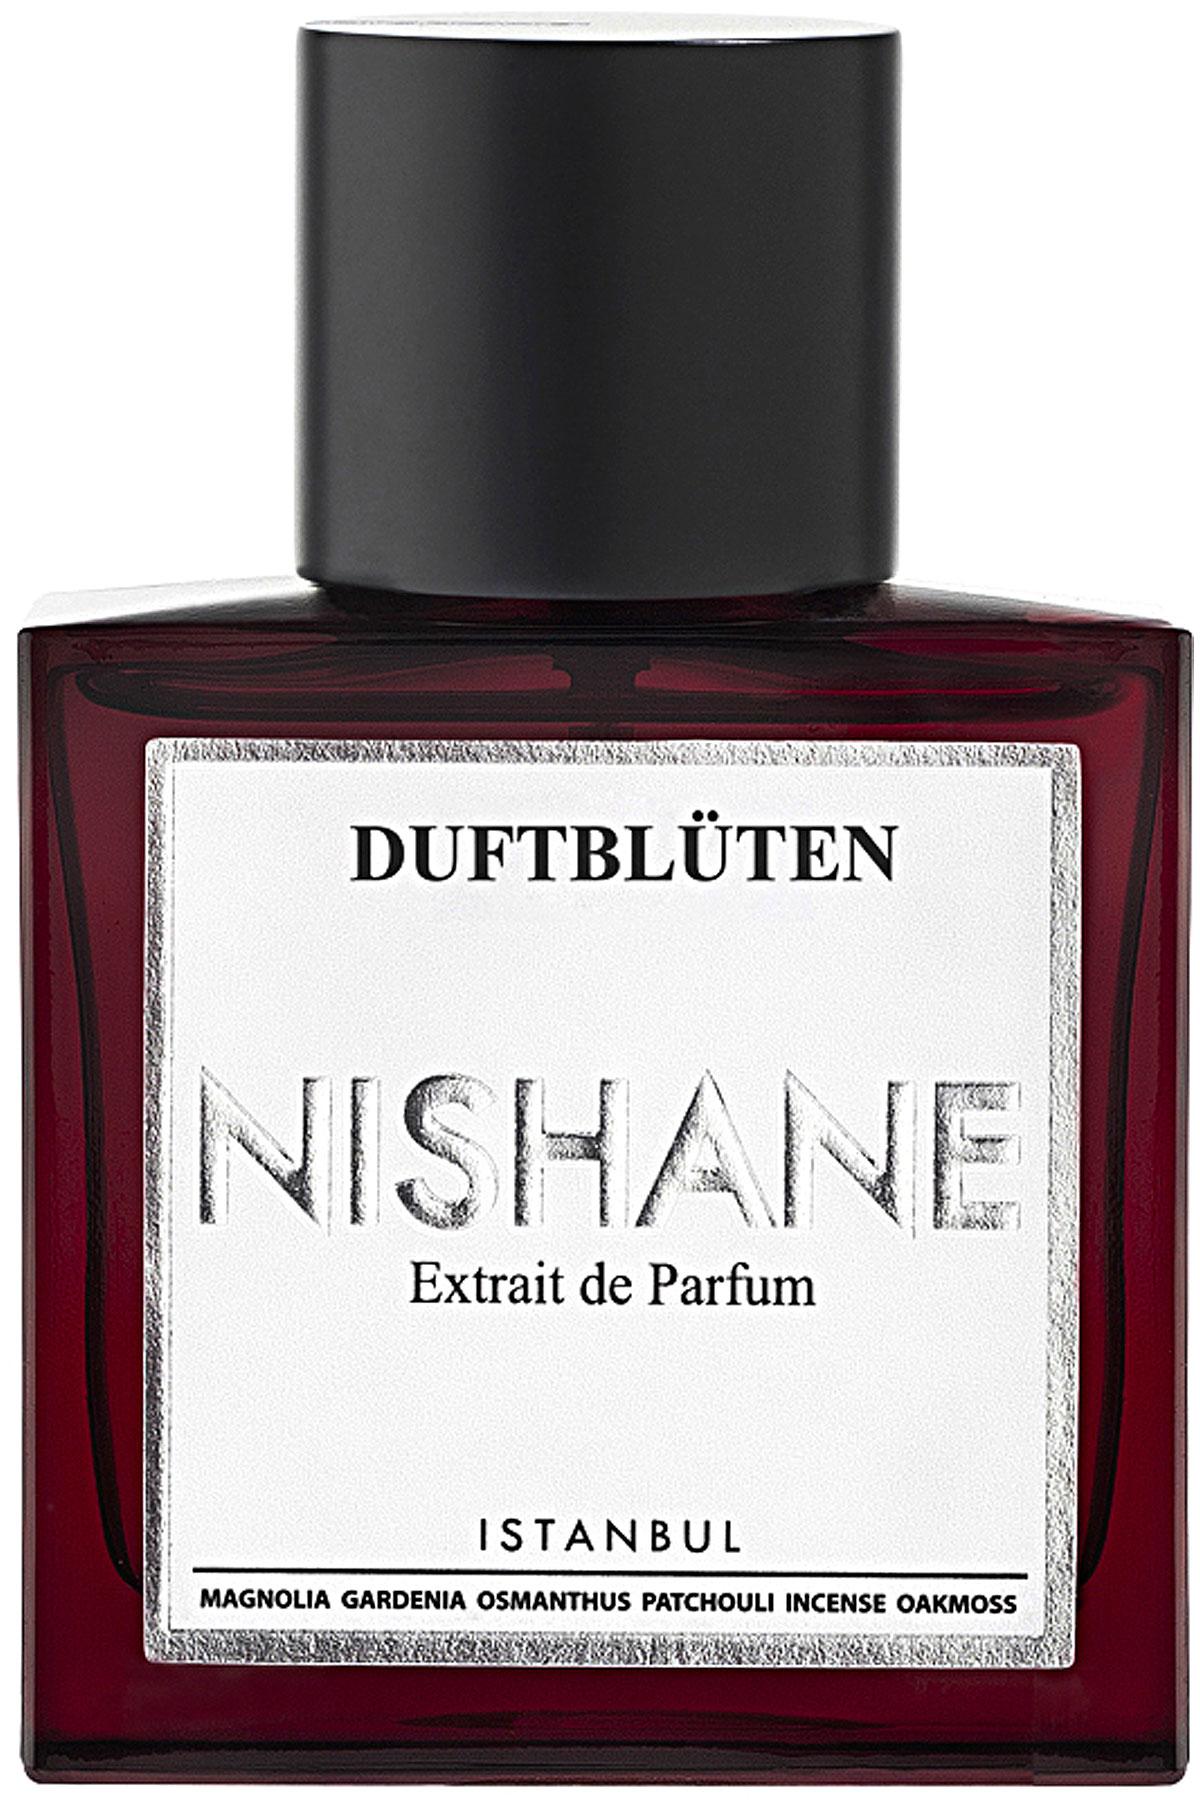 Nishane Fragrances for Men, Duftbluten - Extrait De Parfum - 50 Ml, 2019, 50 ml